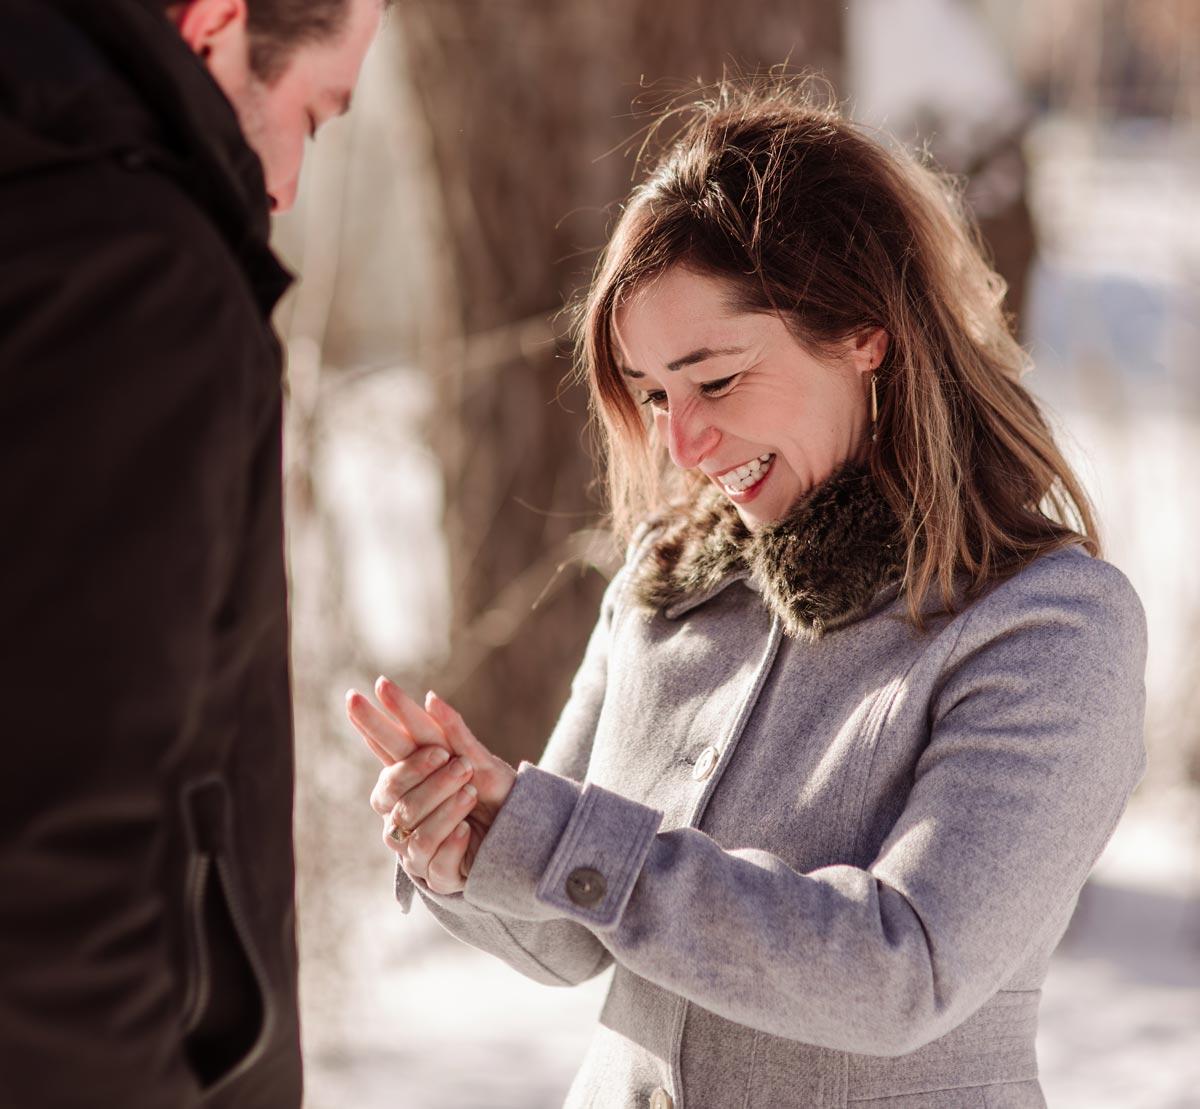 minneapolis wedding proposal in the snow